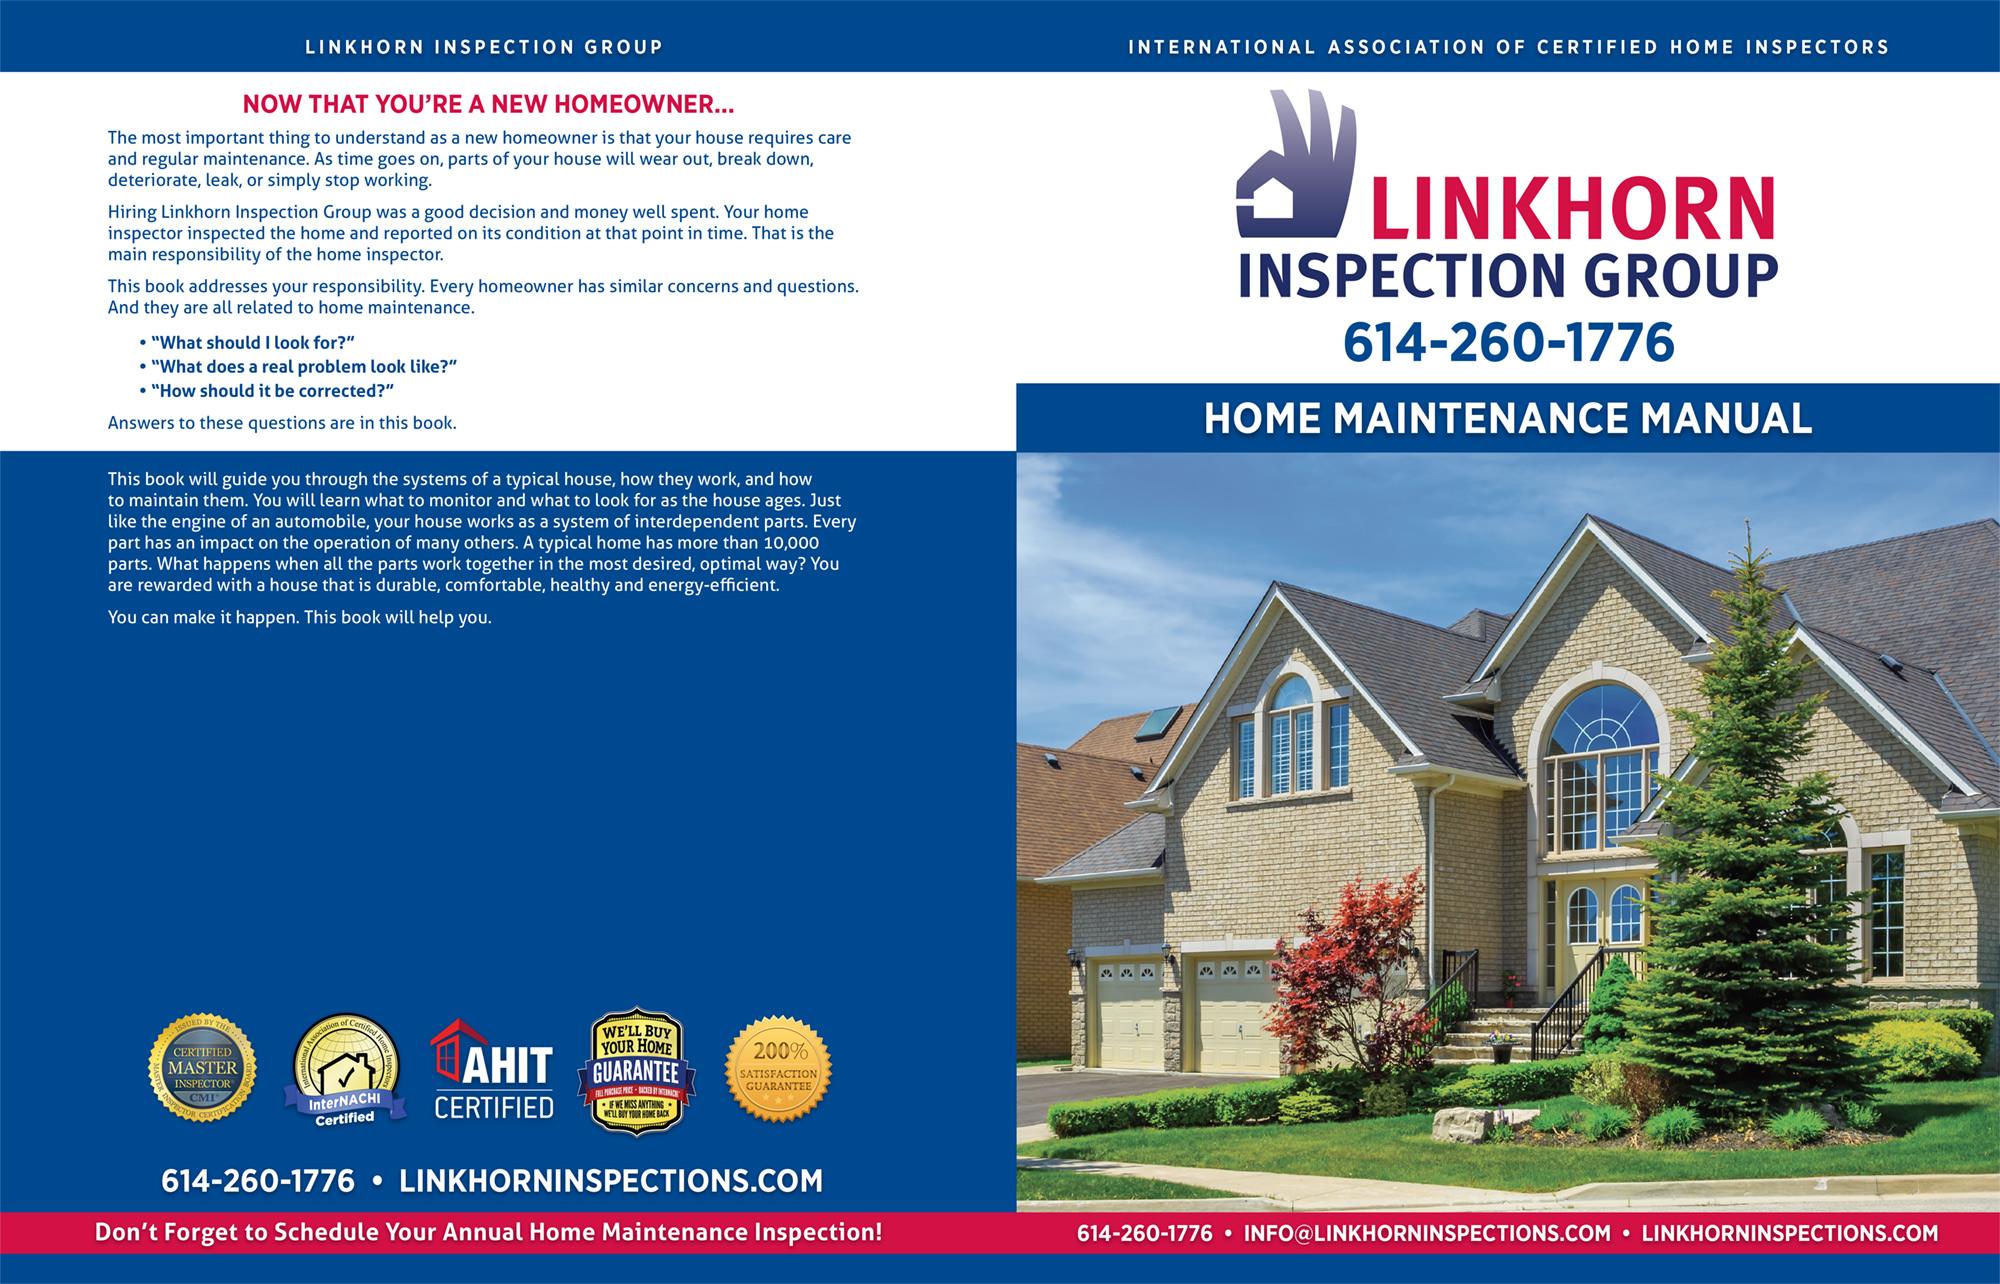 Custom Home Maintenance Books Linkhorn Inspection Group-Certified Master Inspector